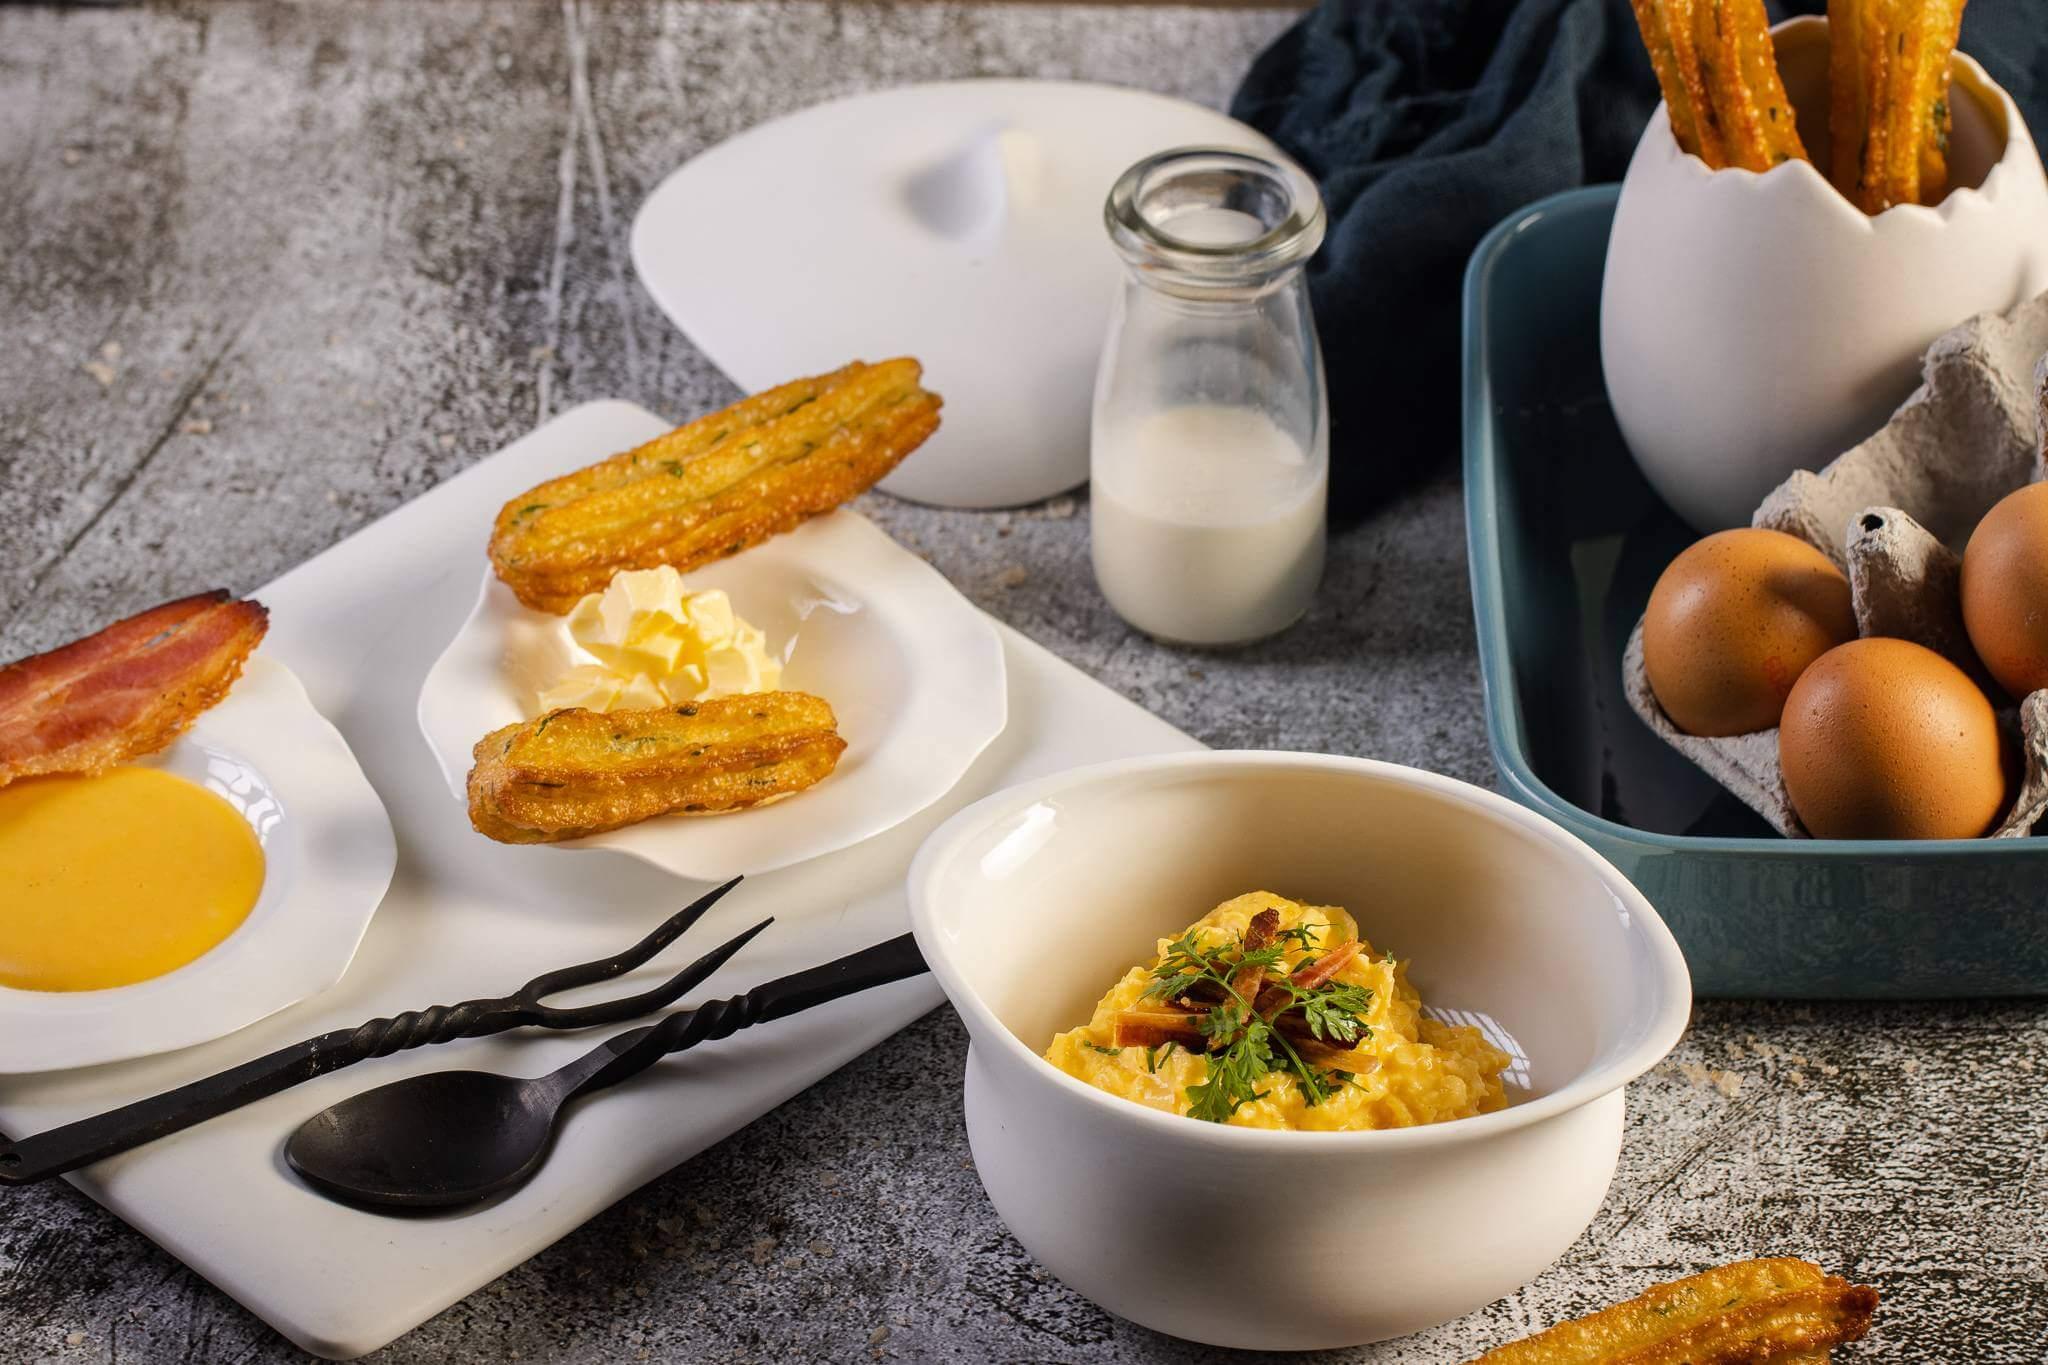 Scrambled eggs με αλμυρά churros, μπέικον και σάλτσα τσένταρ_1